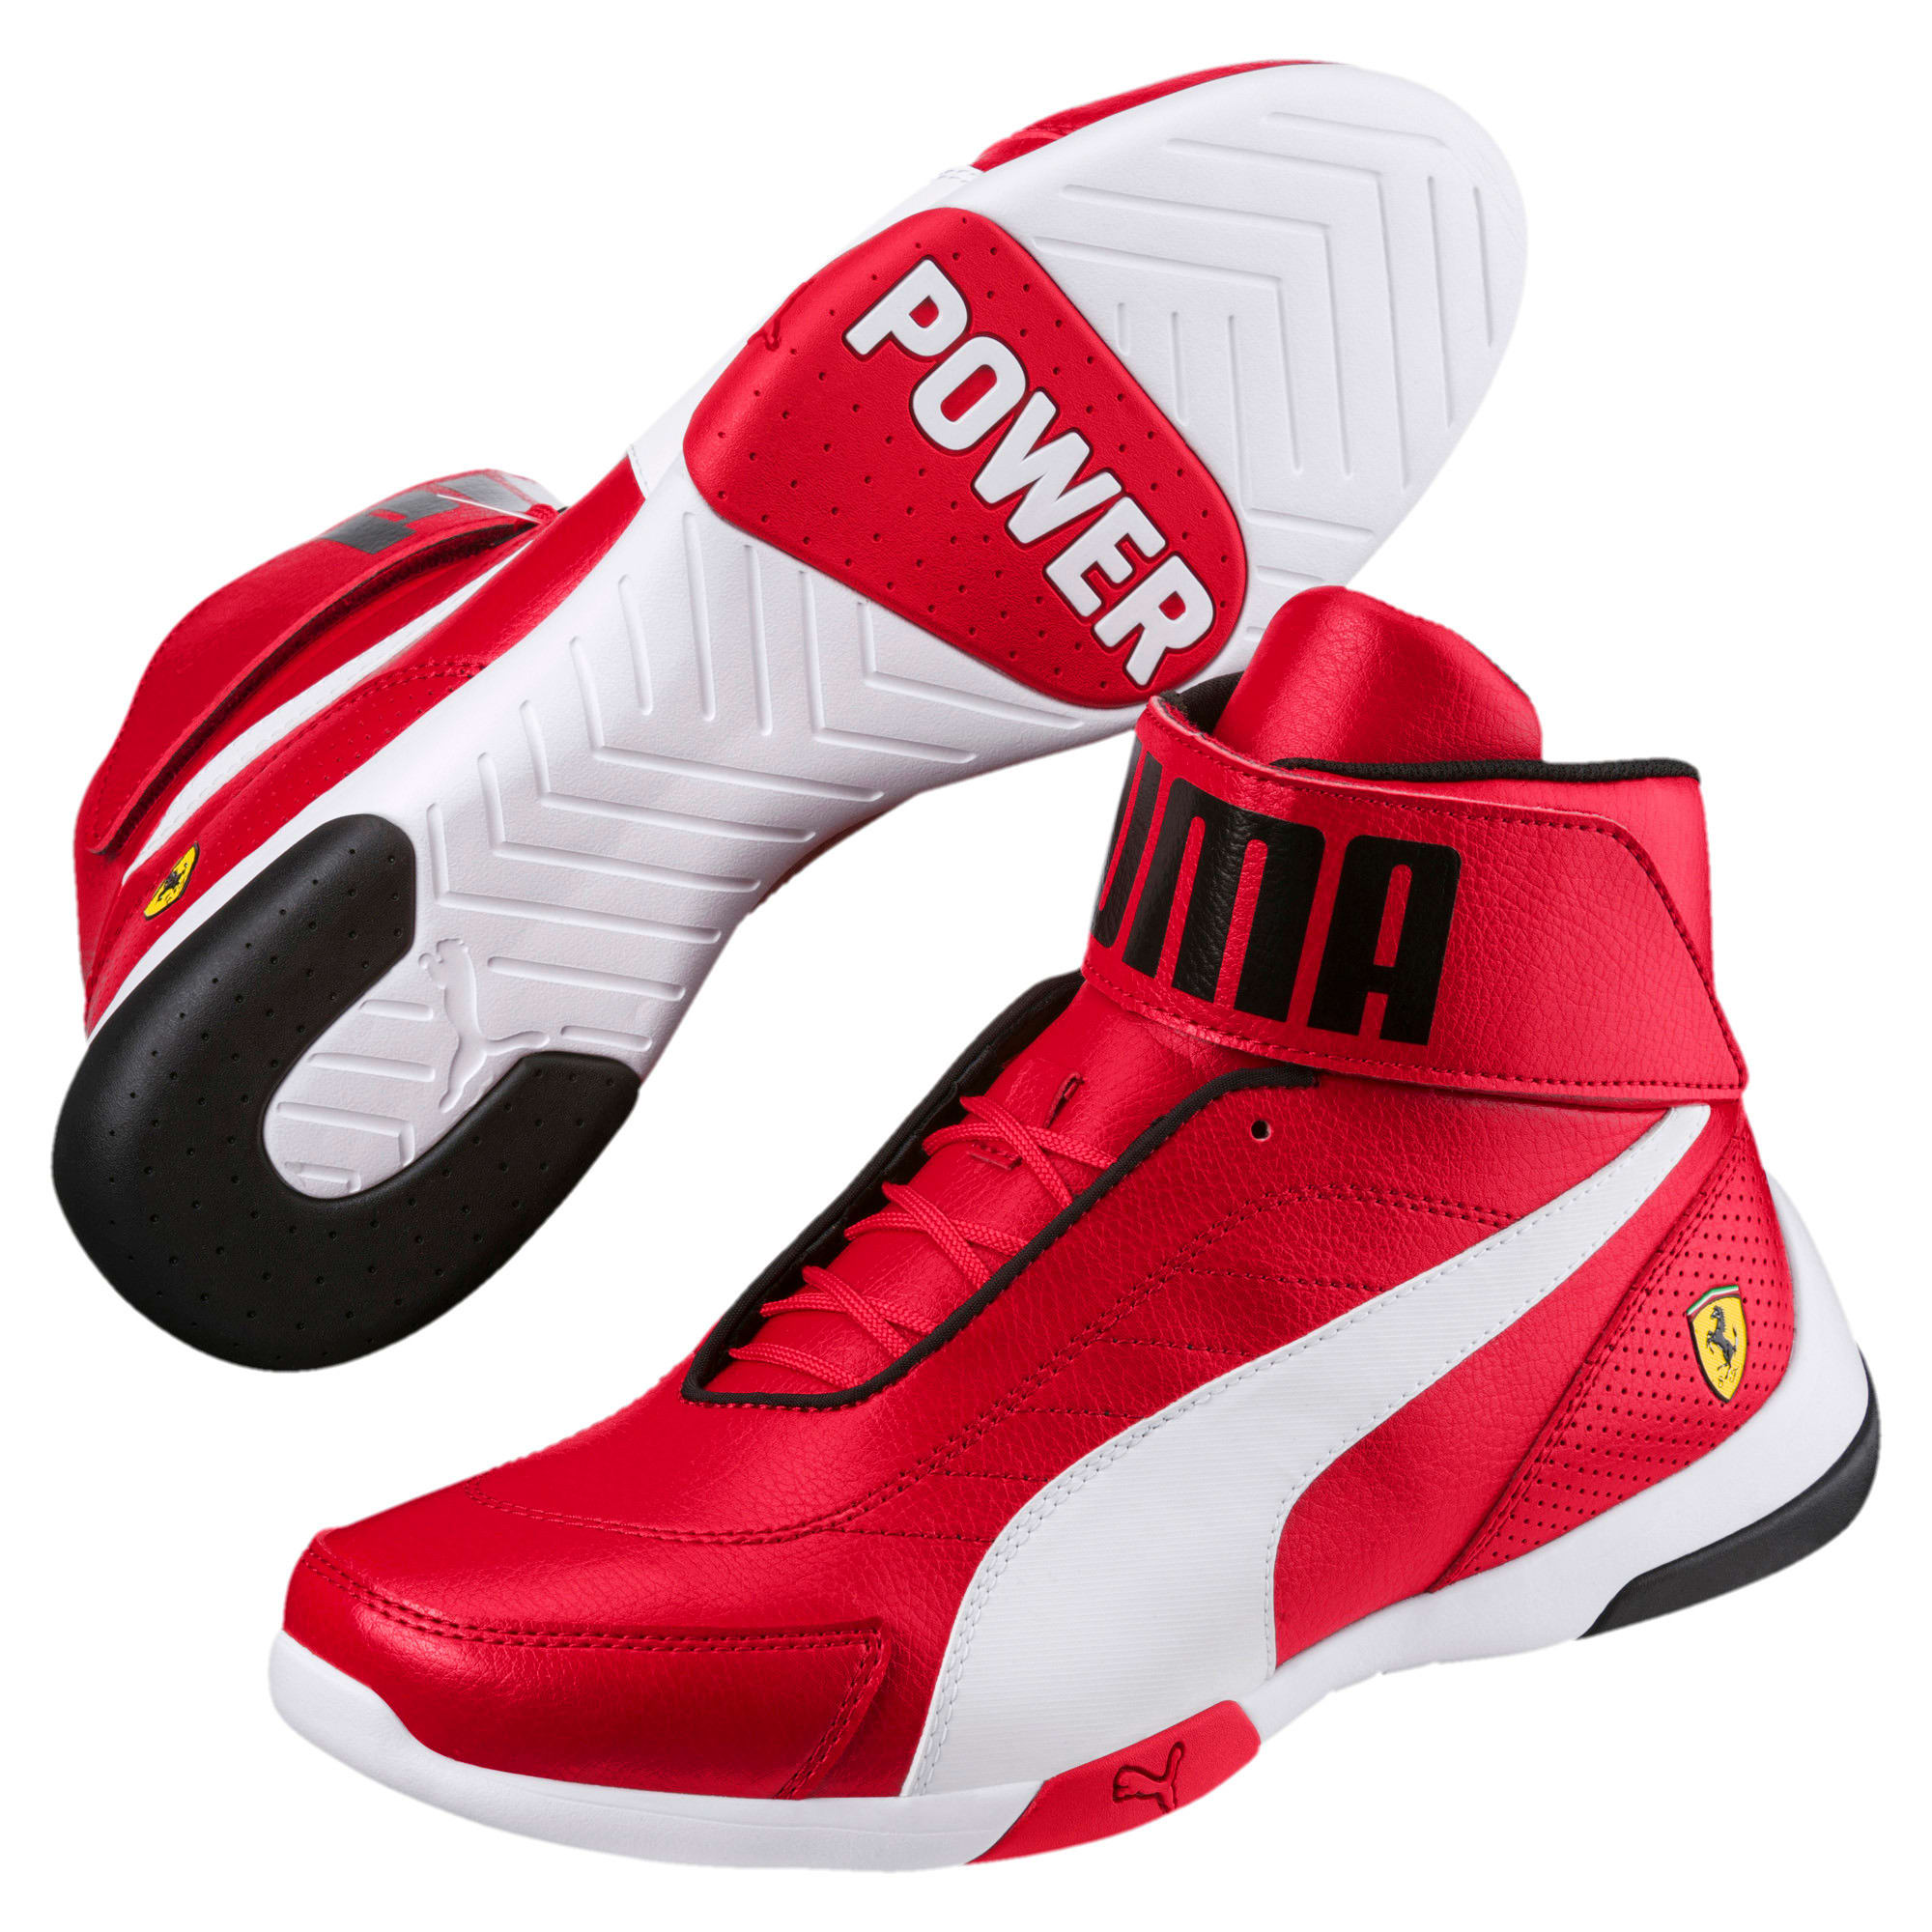 Thumbnail 2 of Scuderia Ferrari Kart Cat Mid III Hi Top Shoes, Rosso Corsa-Puma White, medium